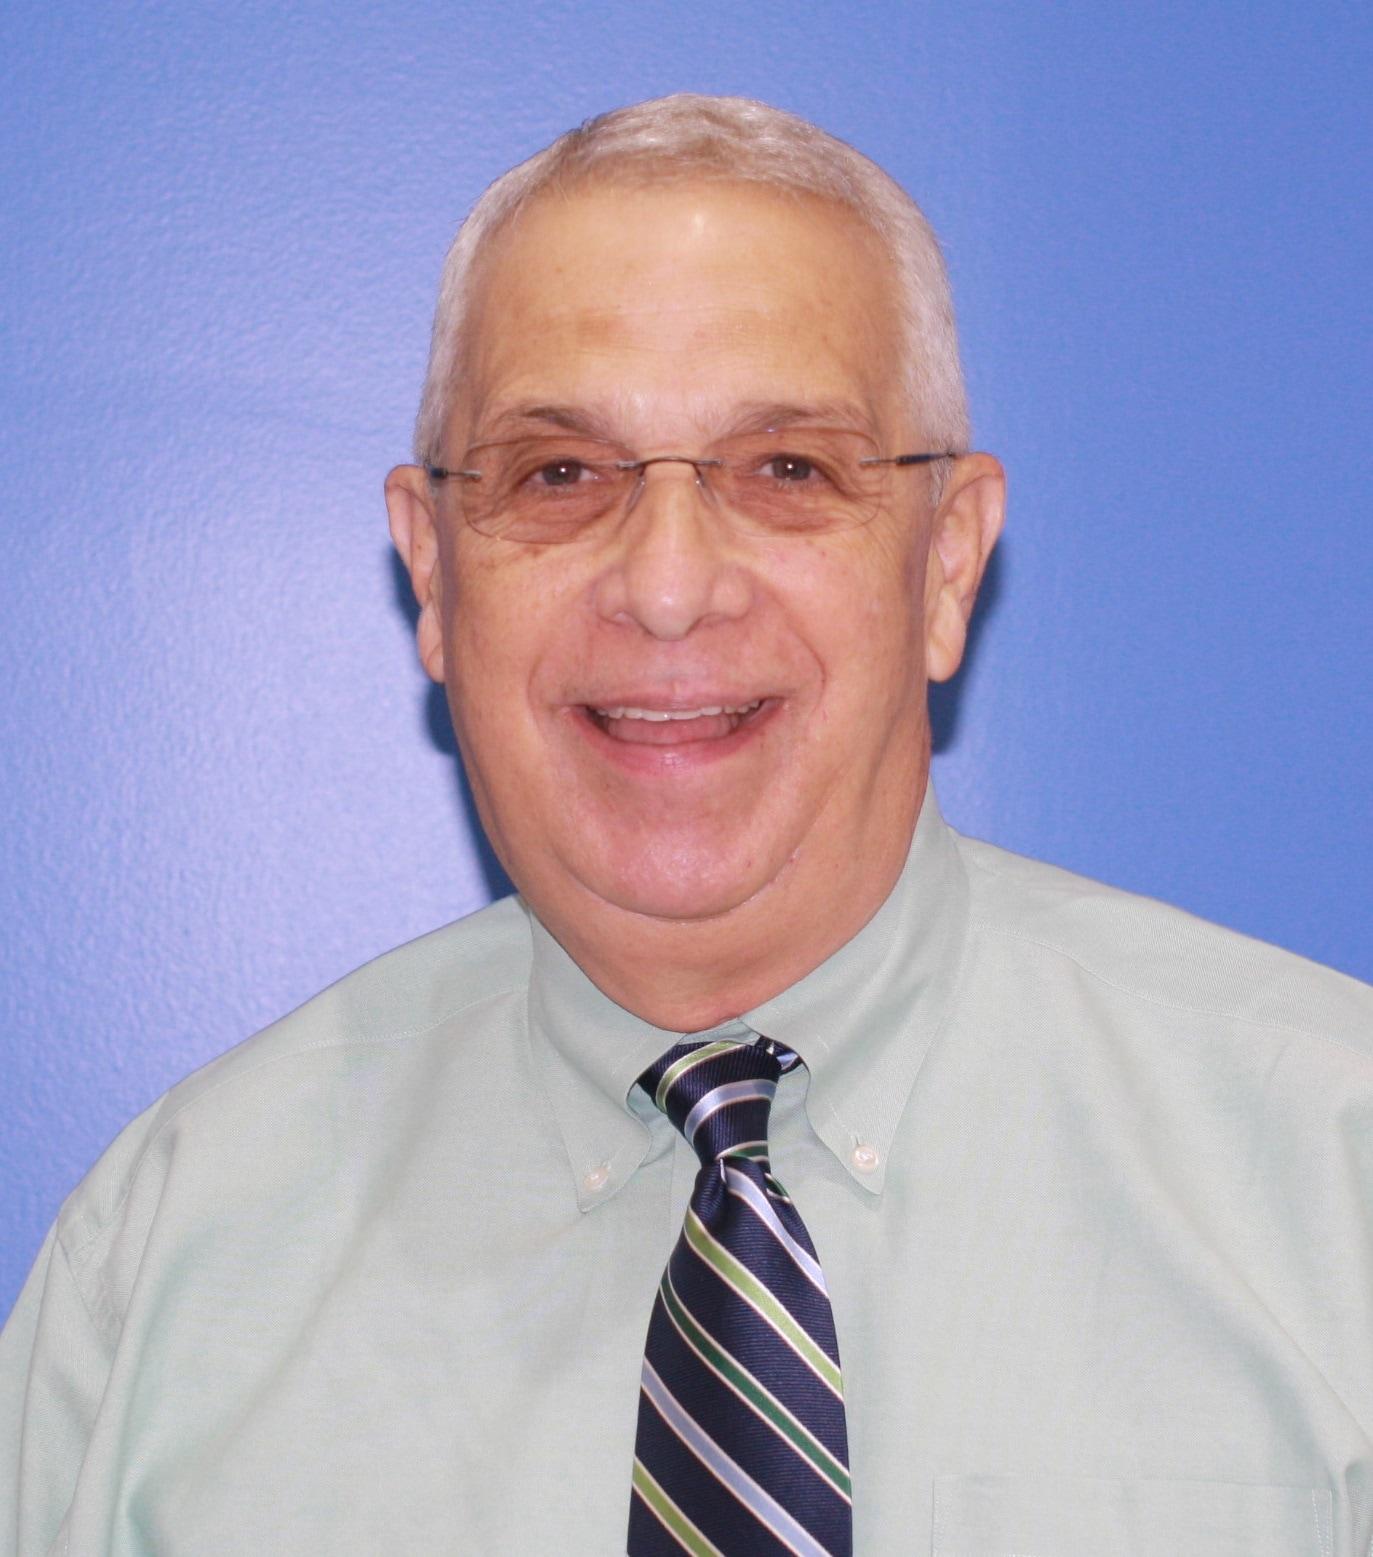 Michael Spears Dealer Trade Manager